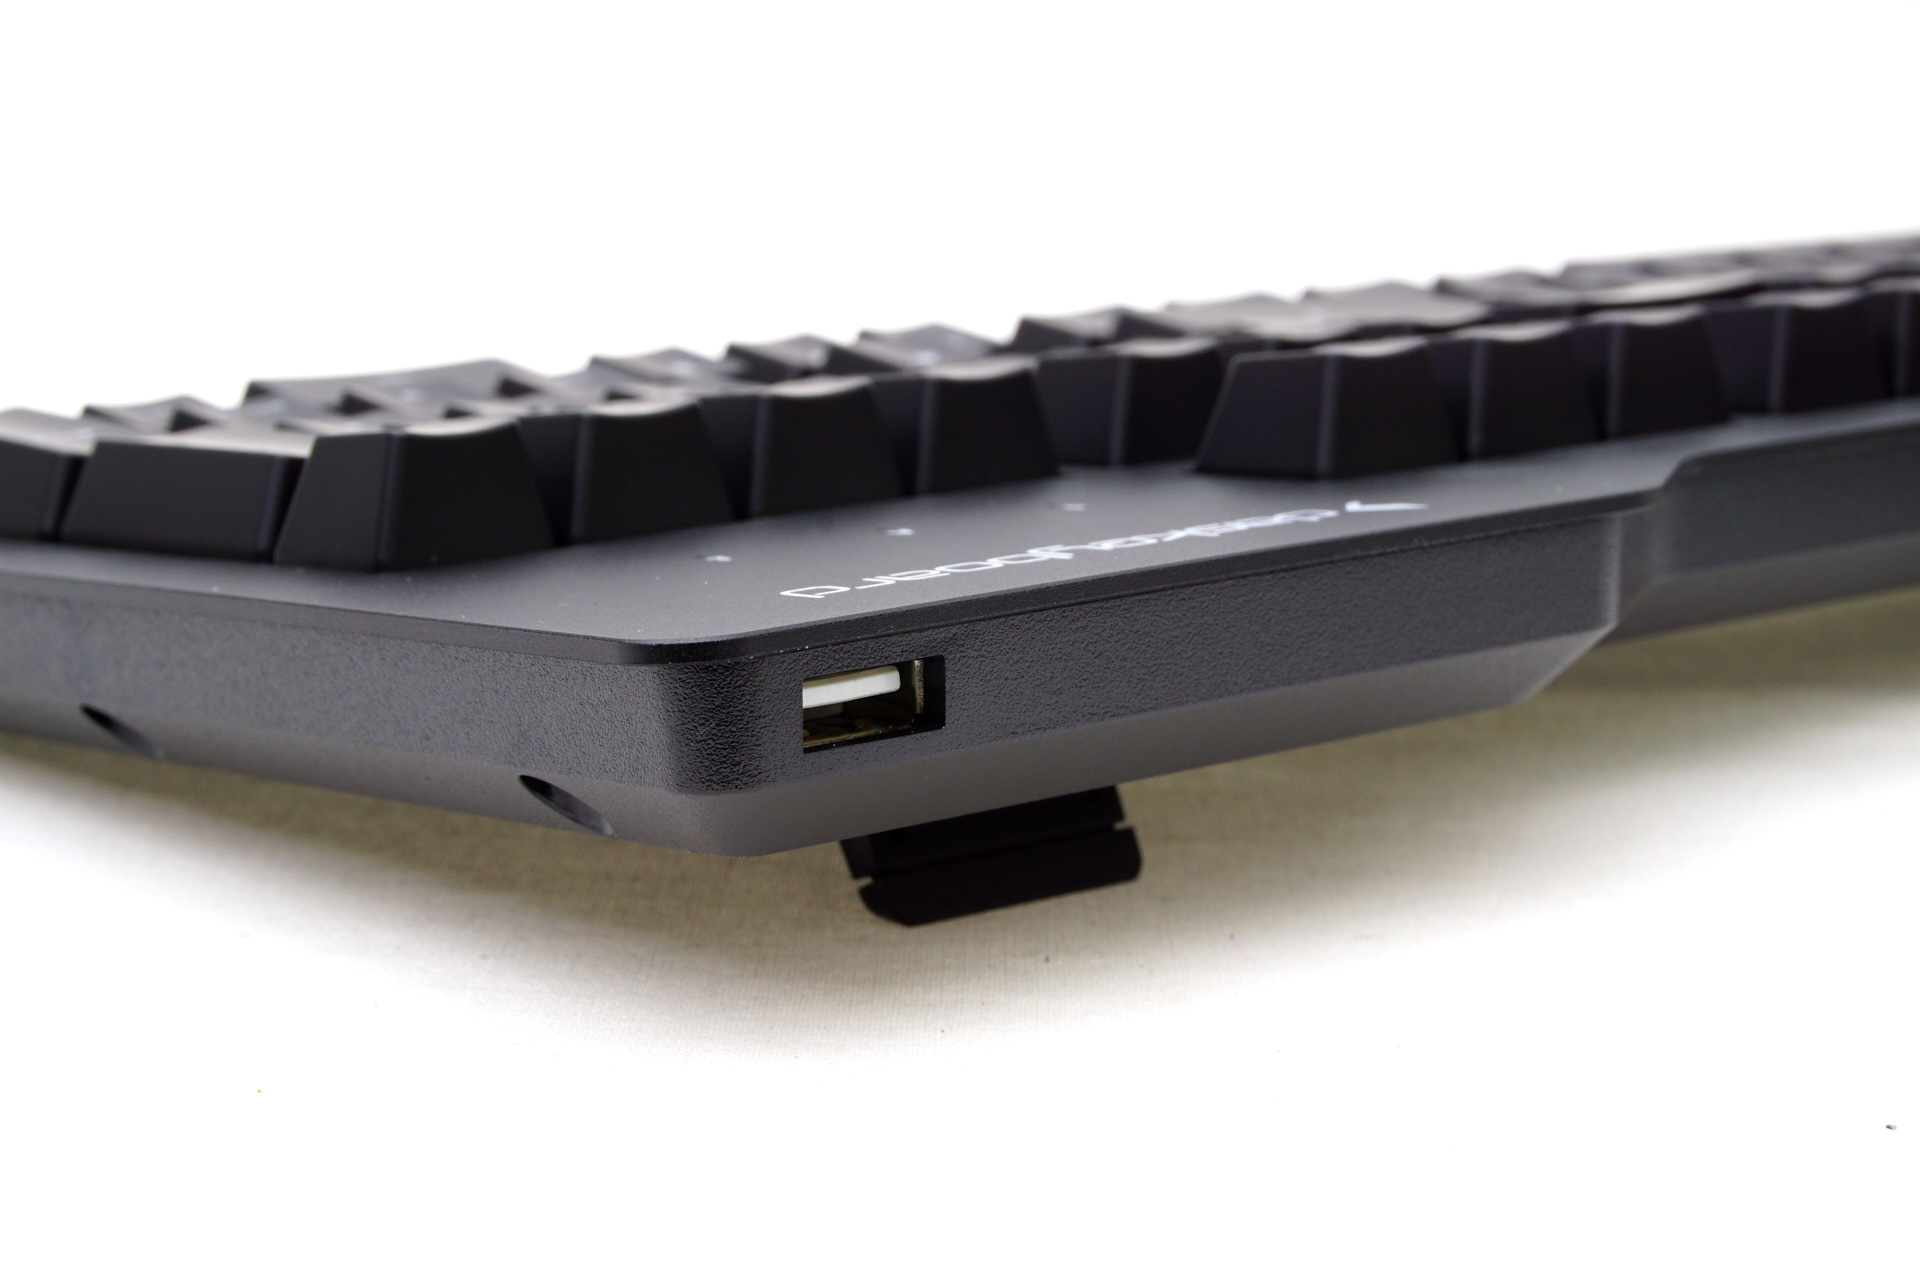 The Das Keyboard Prime 13 Mechanical Keyboard - The Das